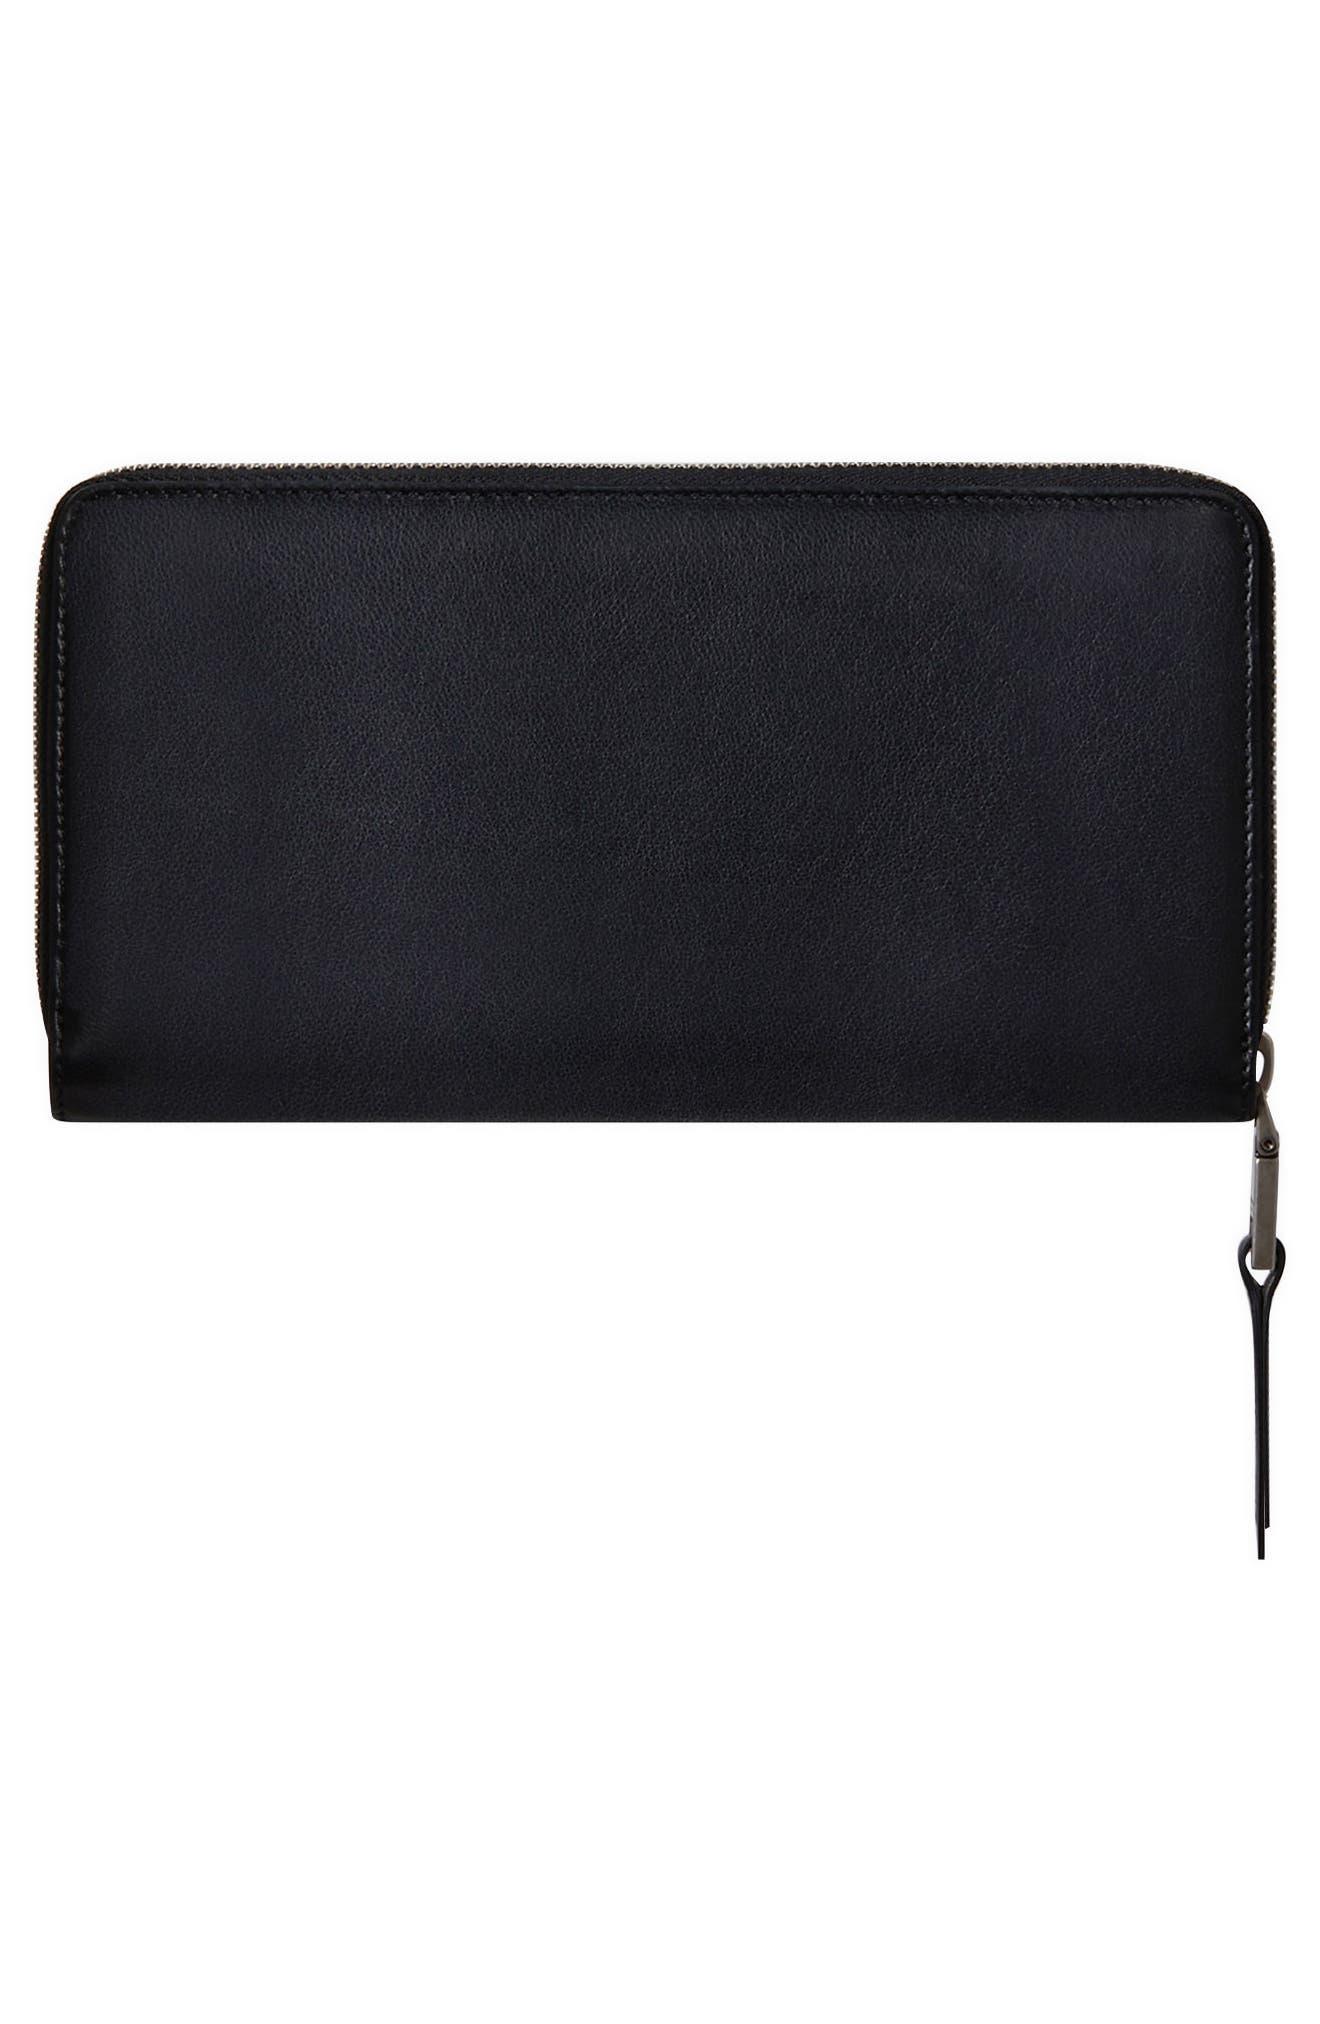 Embossed Logo Leather Zip Around Wallet,                             Alternate thumbnail 3, color,                             BLACK